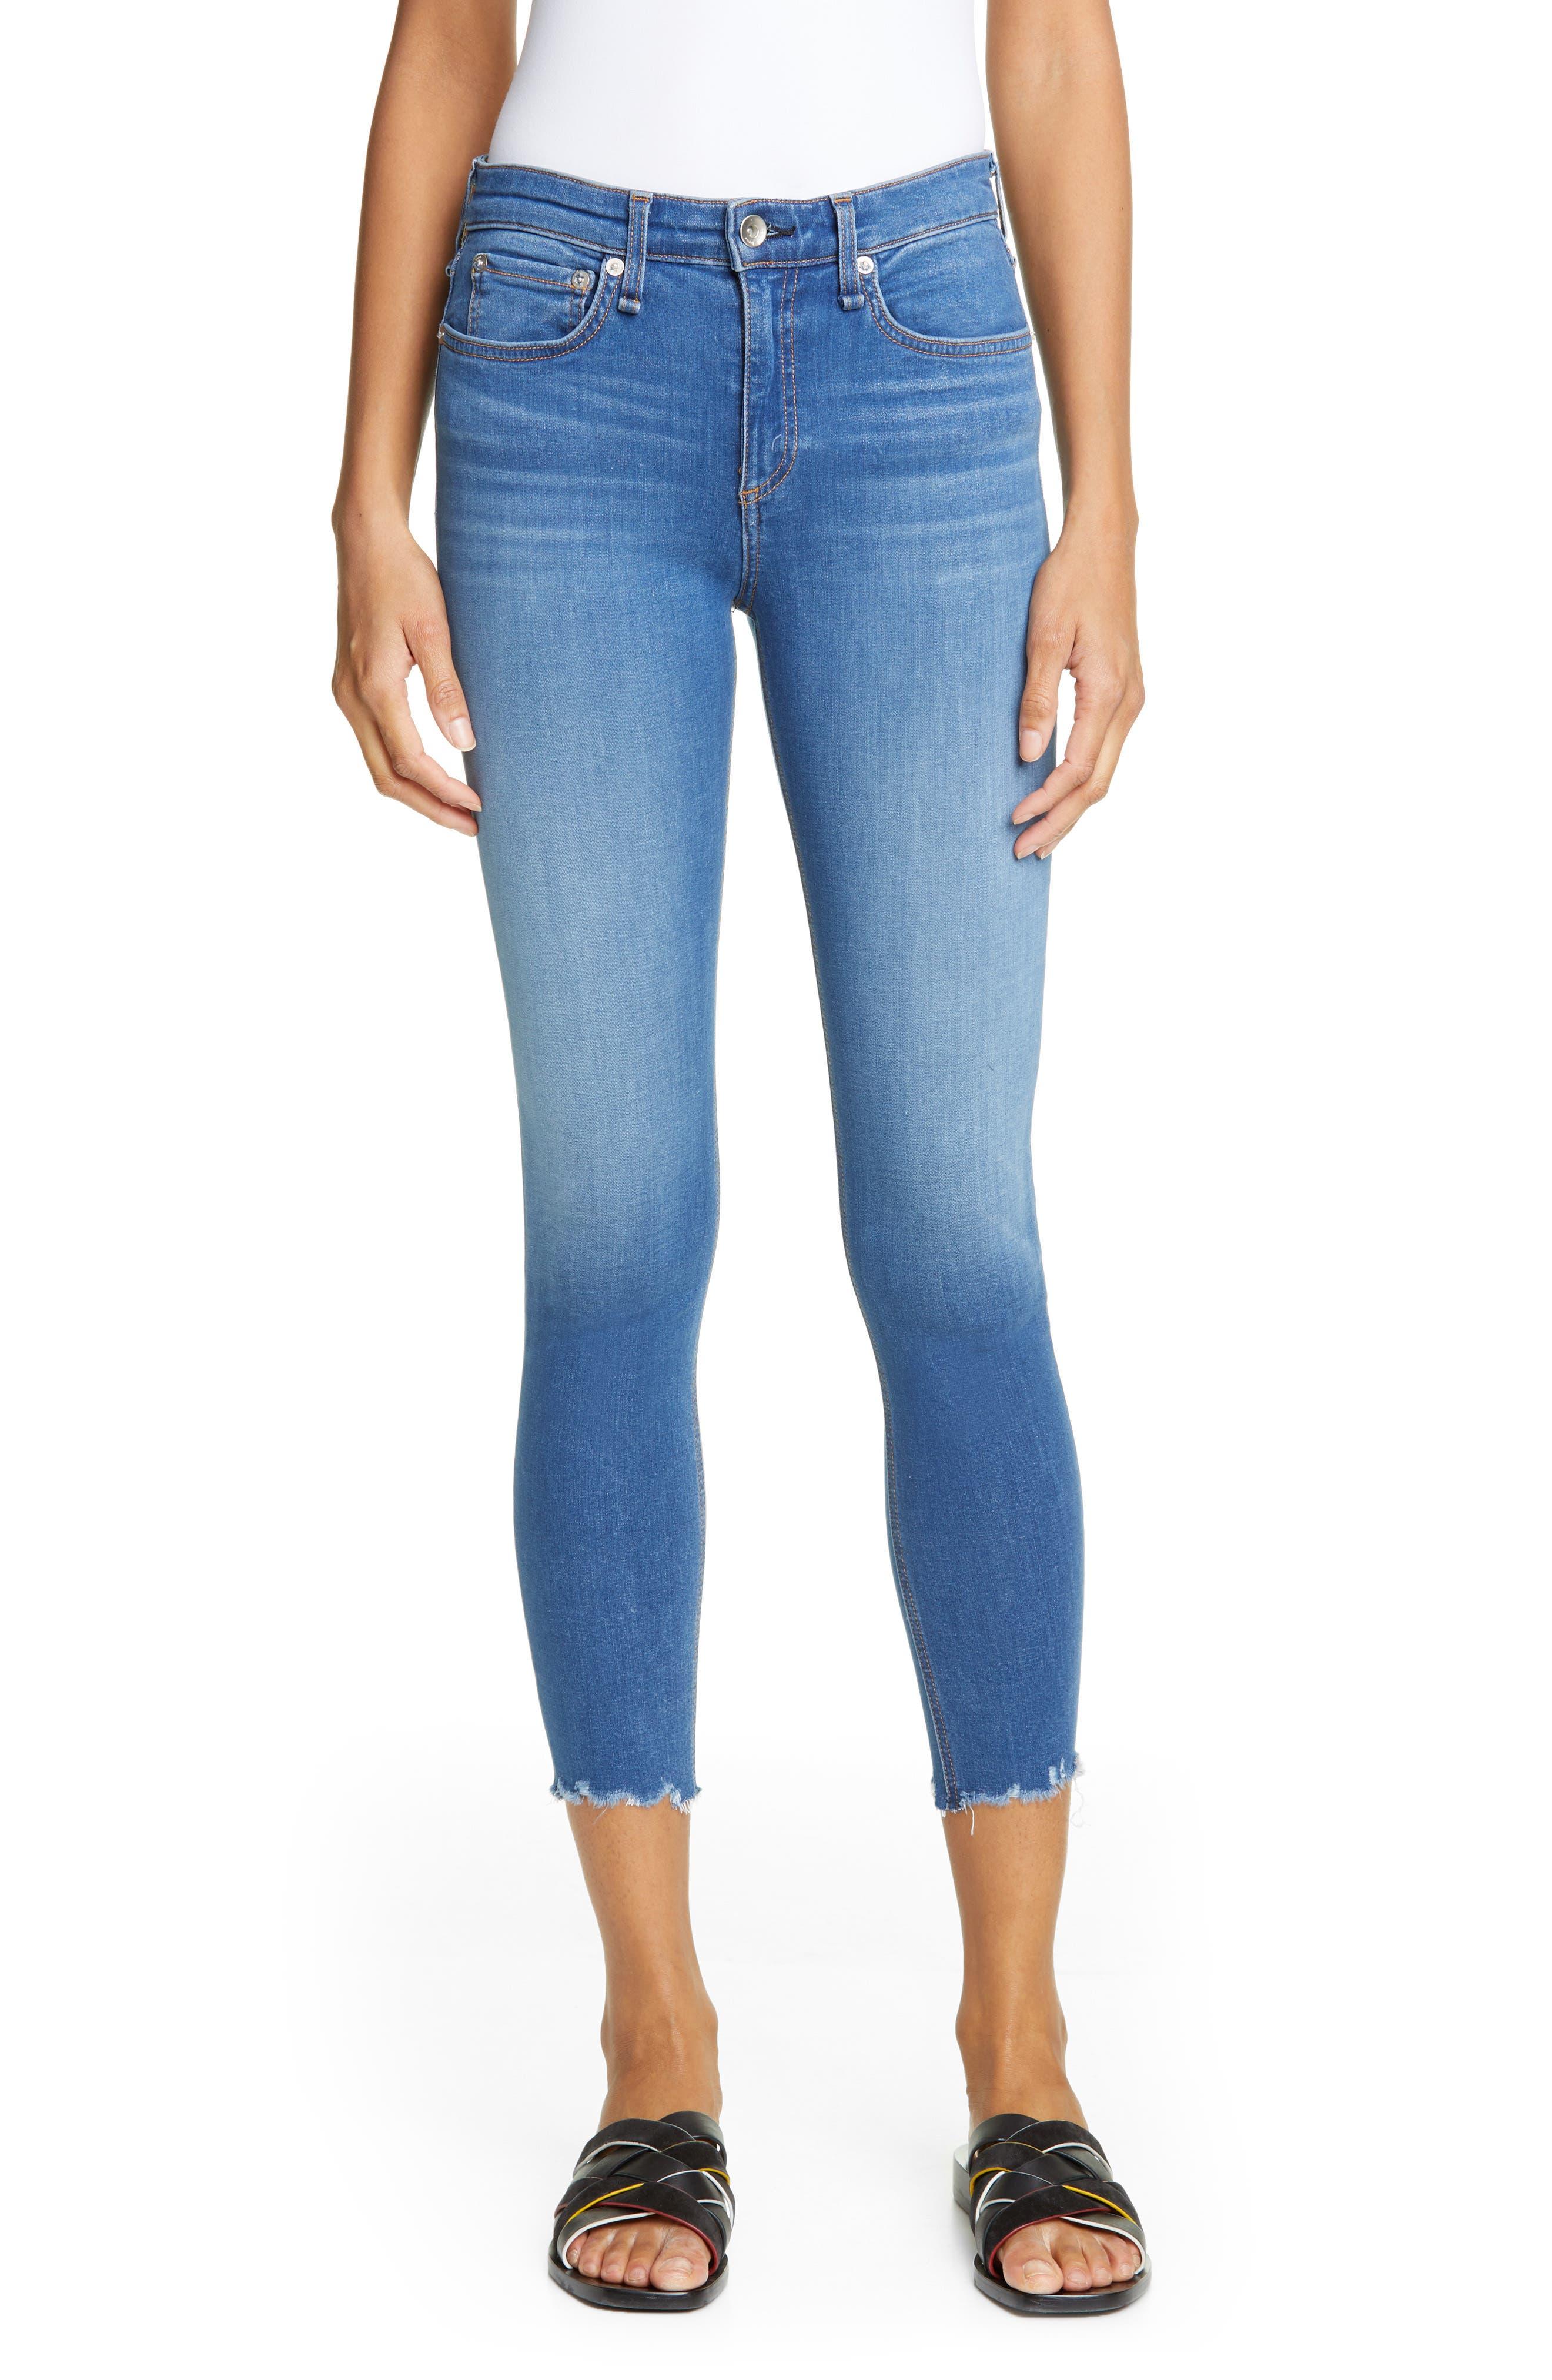 RAG & BONE, Cate High Waist Ankle Skinny Jeans, Main thumbnail 1, color, FLINT